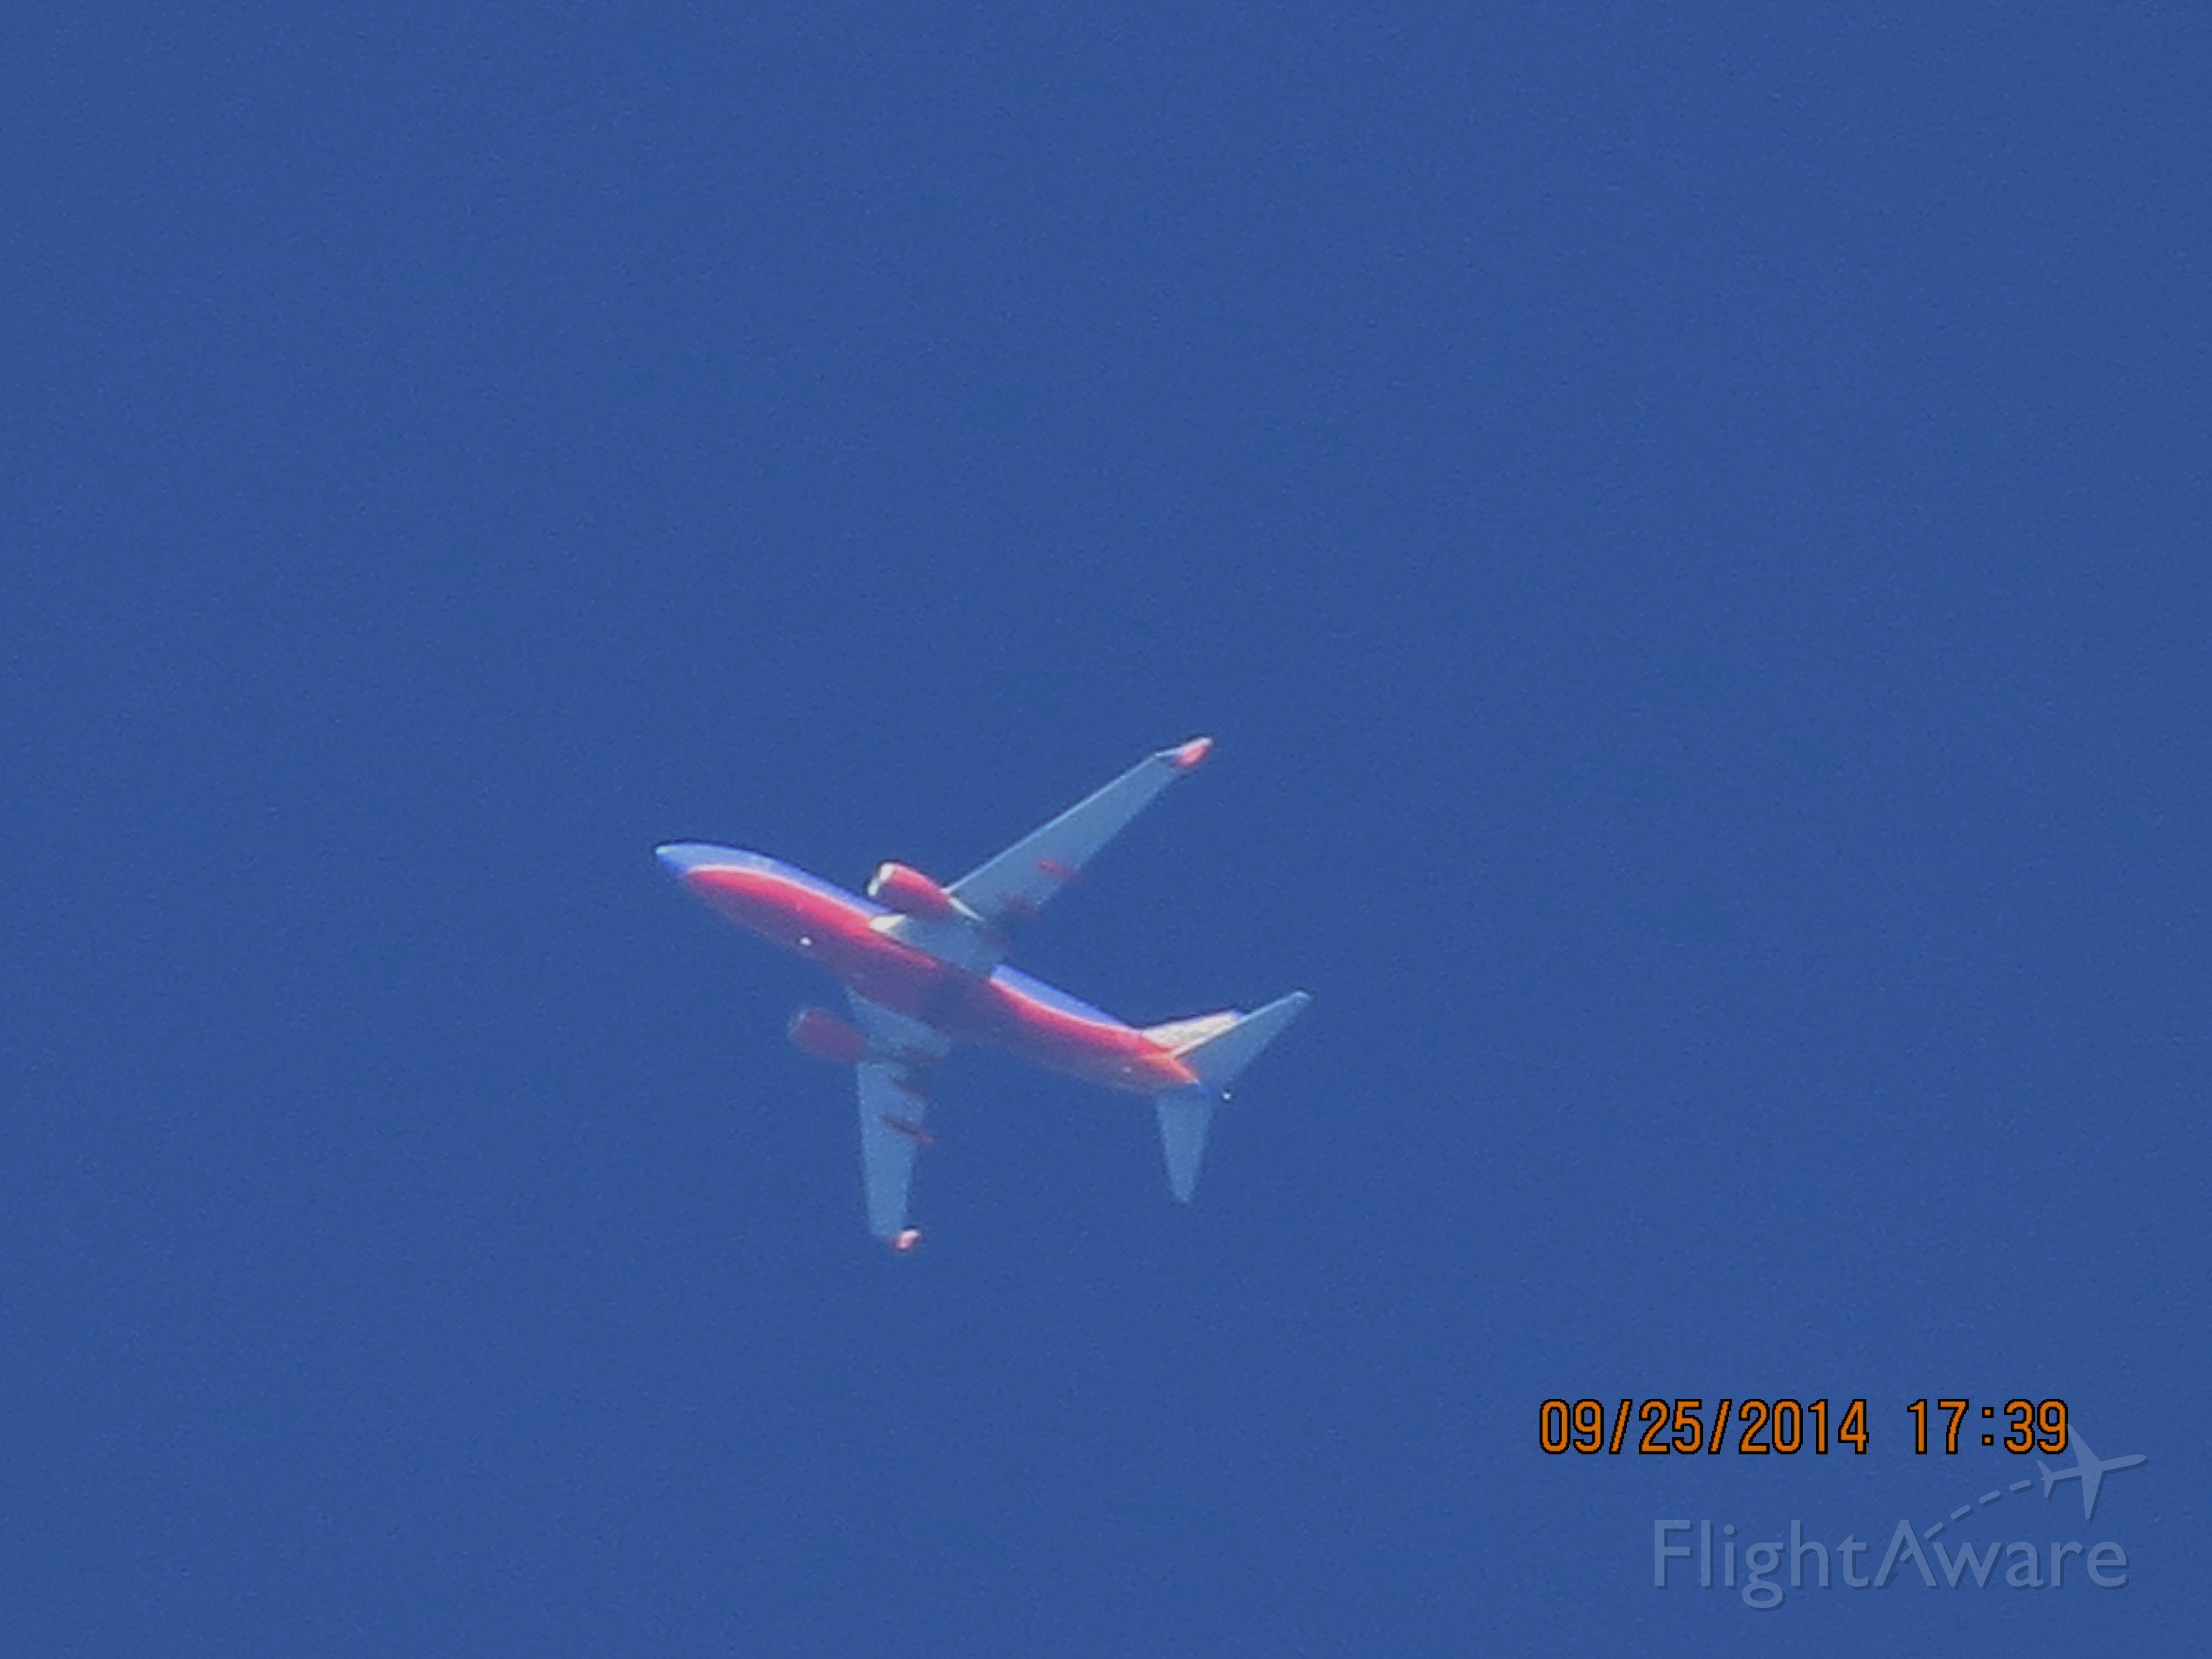 Boeing 737-700 (N261WN) - Southwest Airlines flight 3679 from ATL to DEN over Baxter Springs Kansas (78KS) at 38,000 feet.